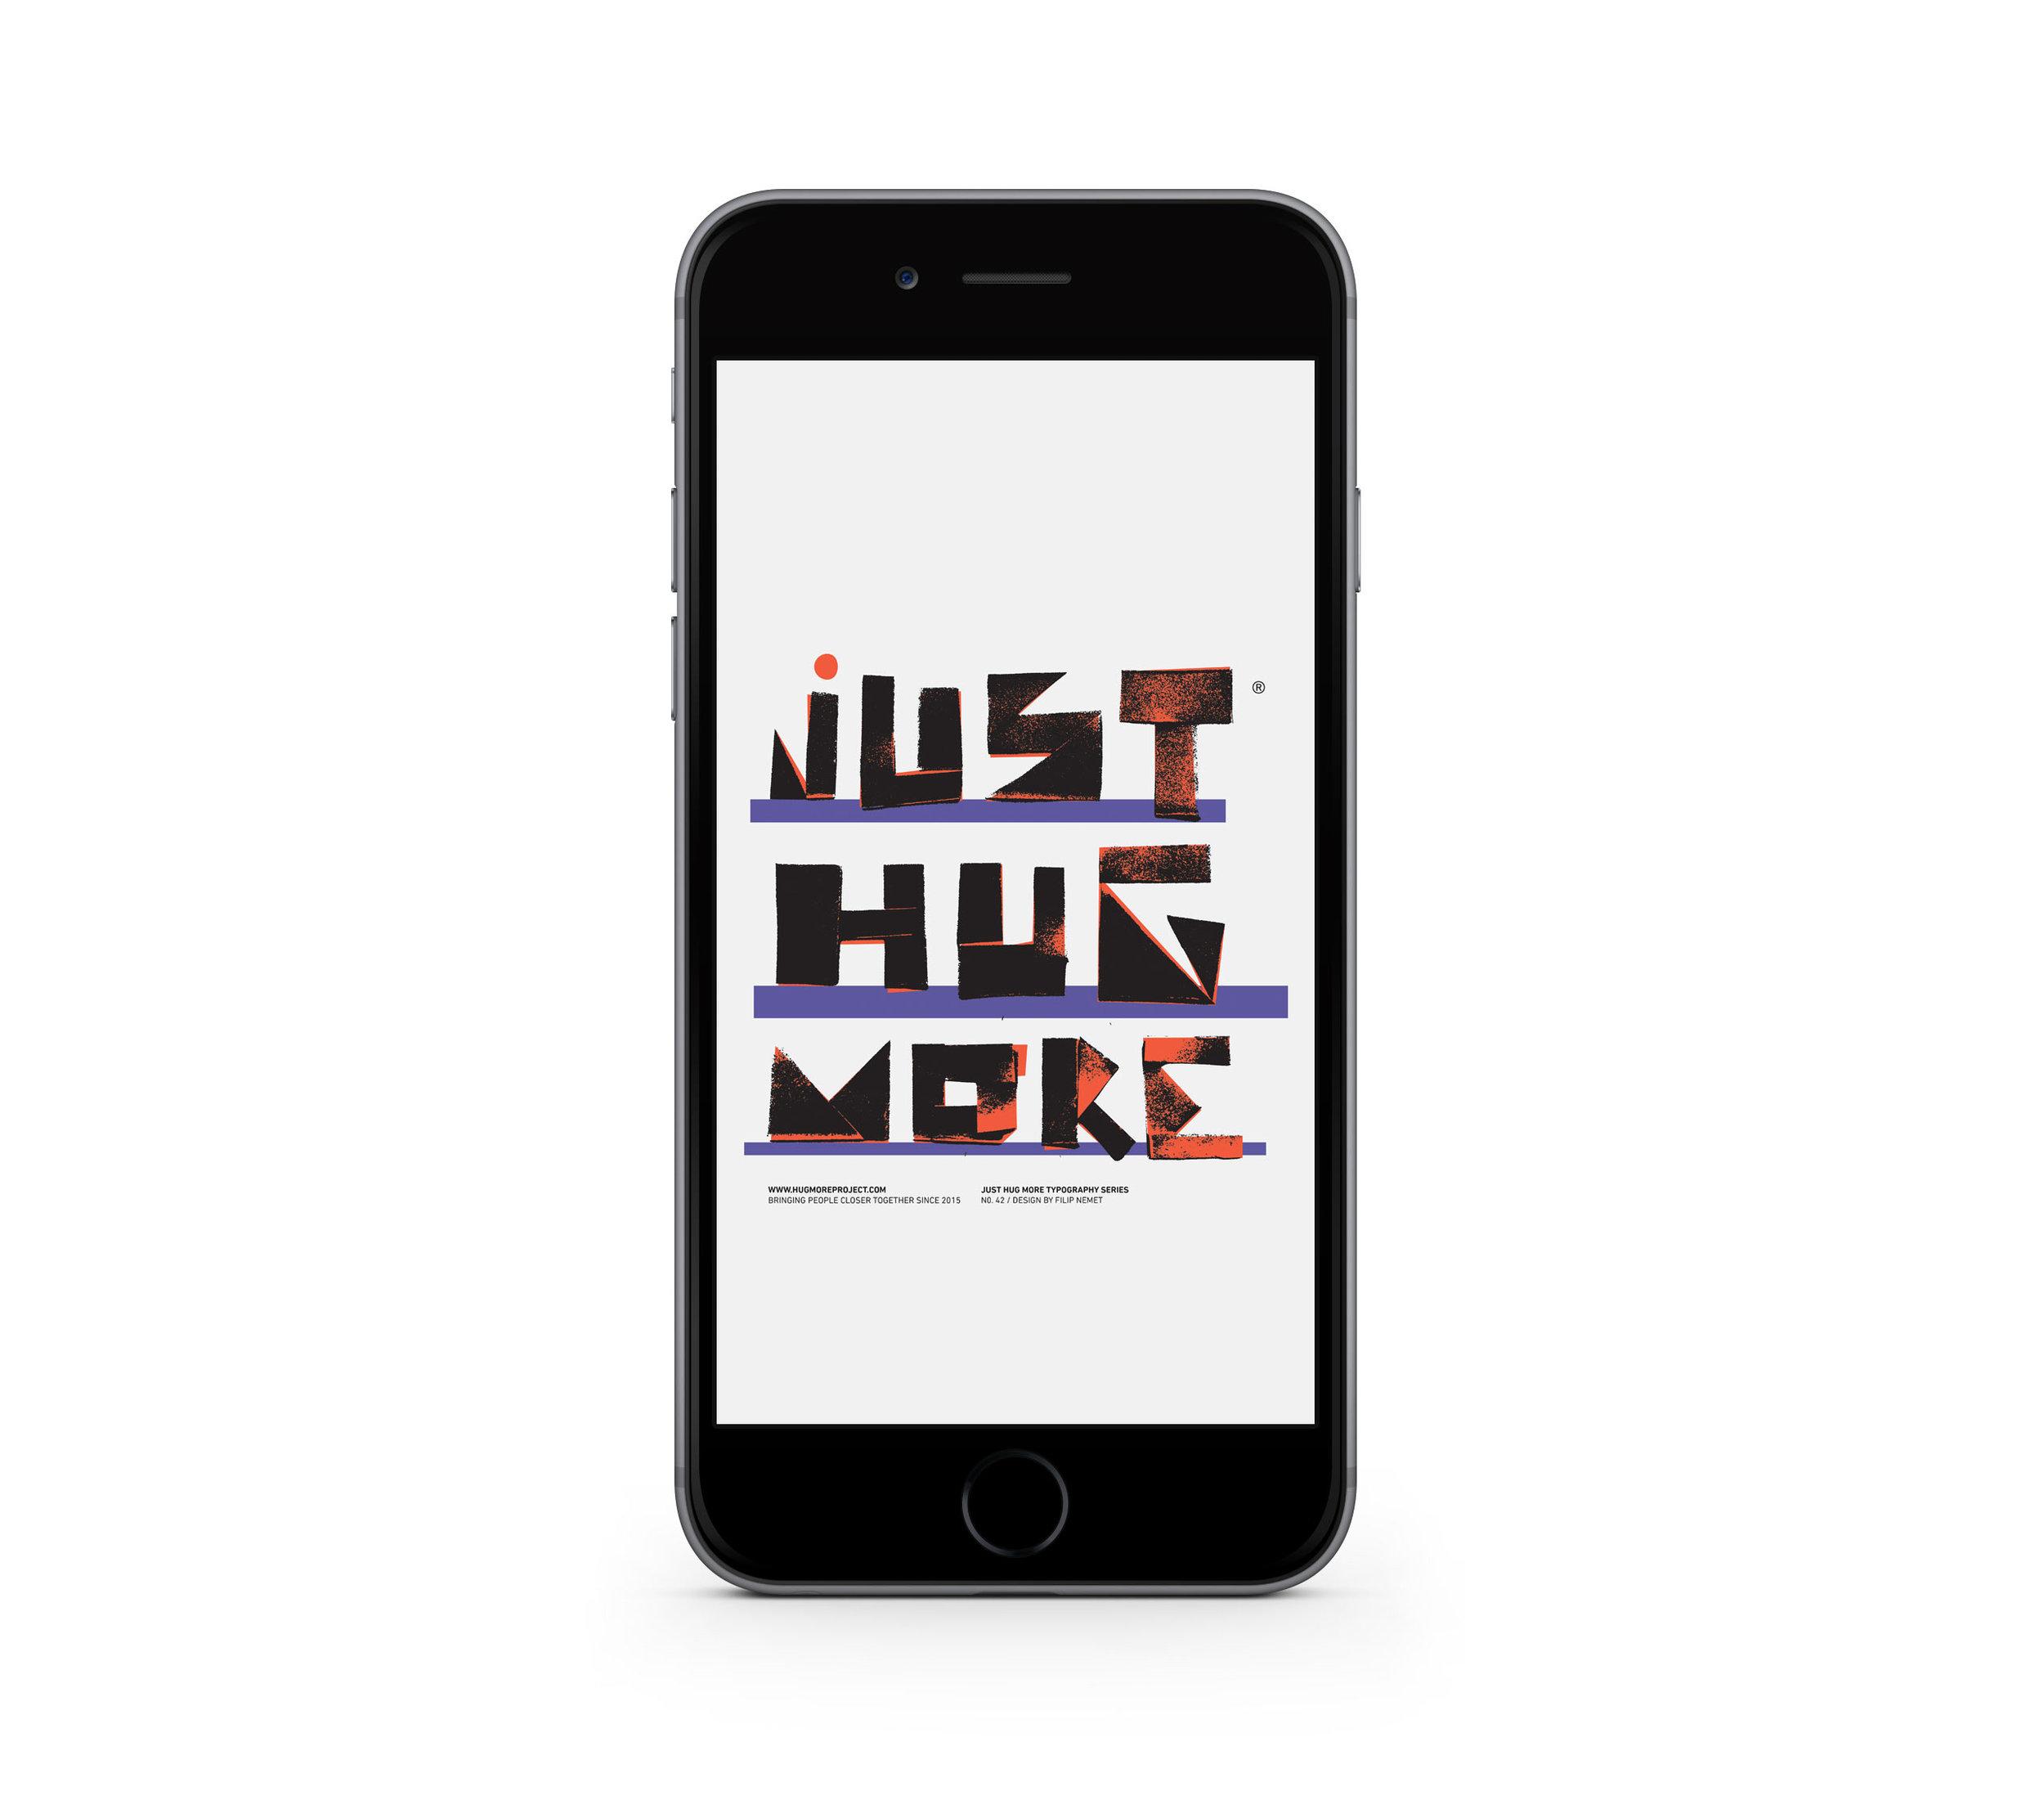 just-hug-more-typo-042-iPhone-mockup-onwhite.jpg